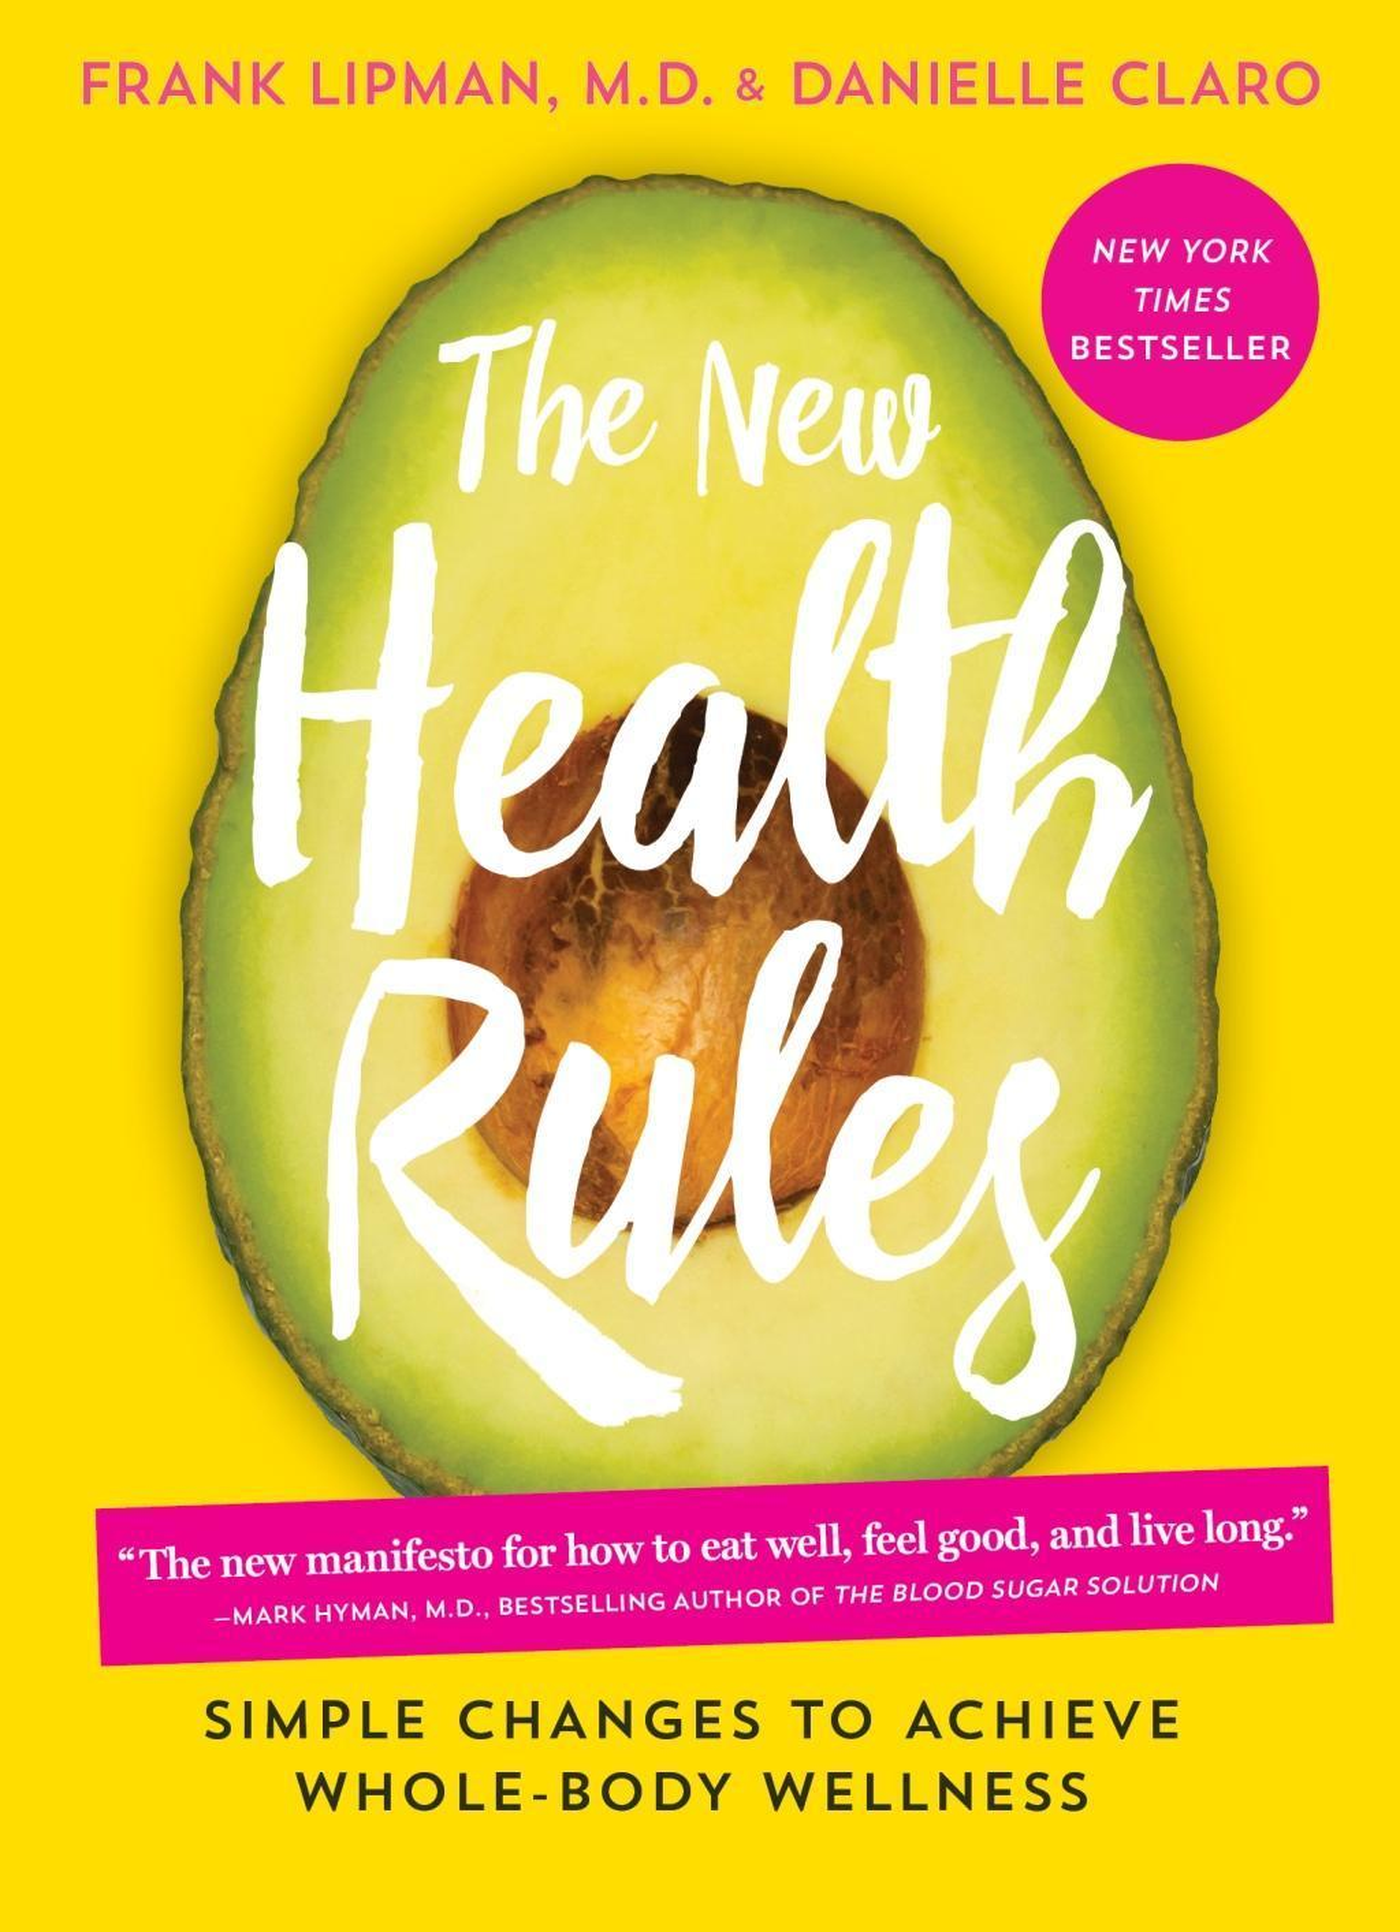 The New Health Rules, Frank Lipman